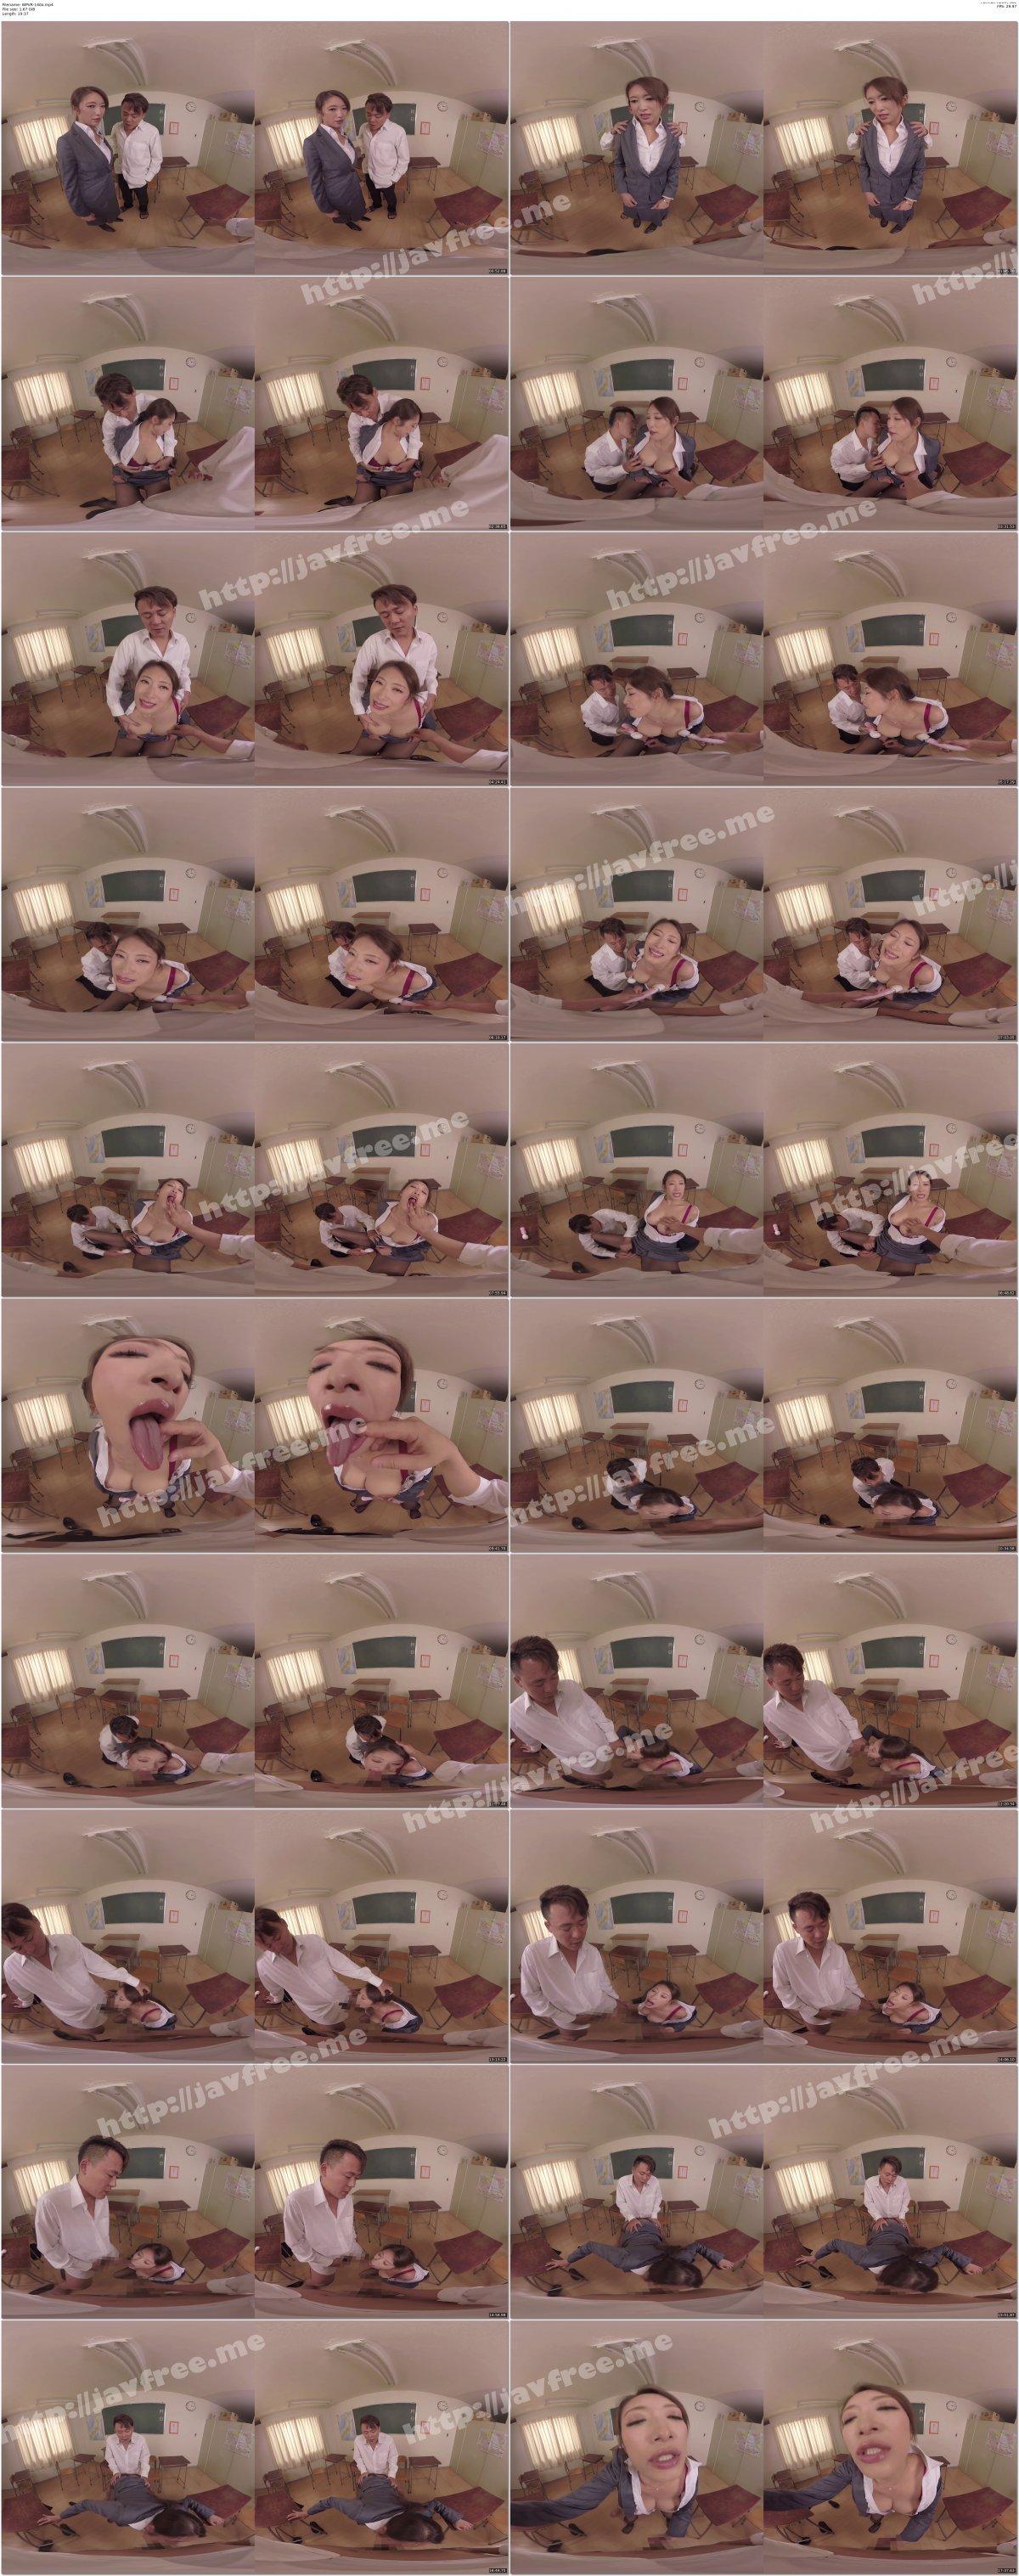 [WPVR-140] 【VR】ツン顔でイキガマンするオンナ教師 小早川怜子 - image WPVR-140a on https://javfree.me